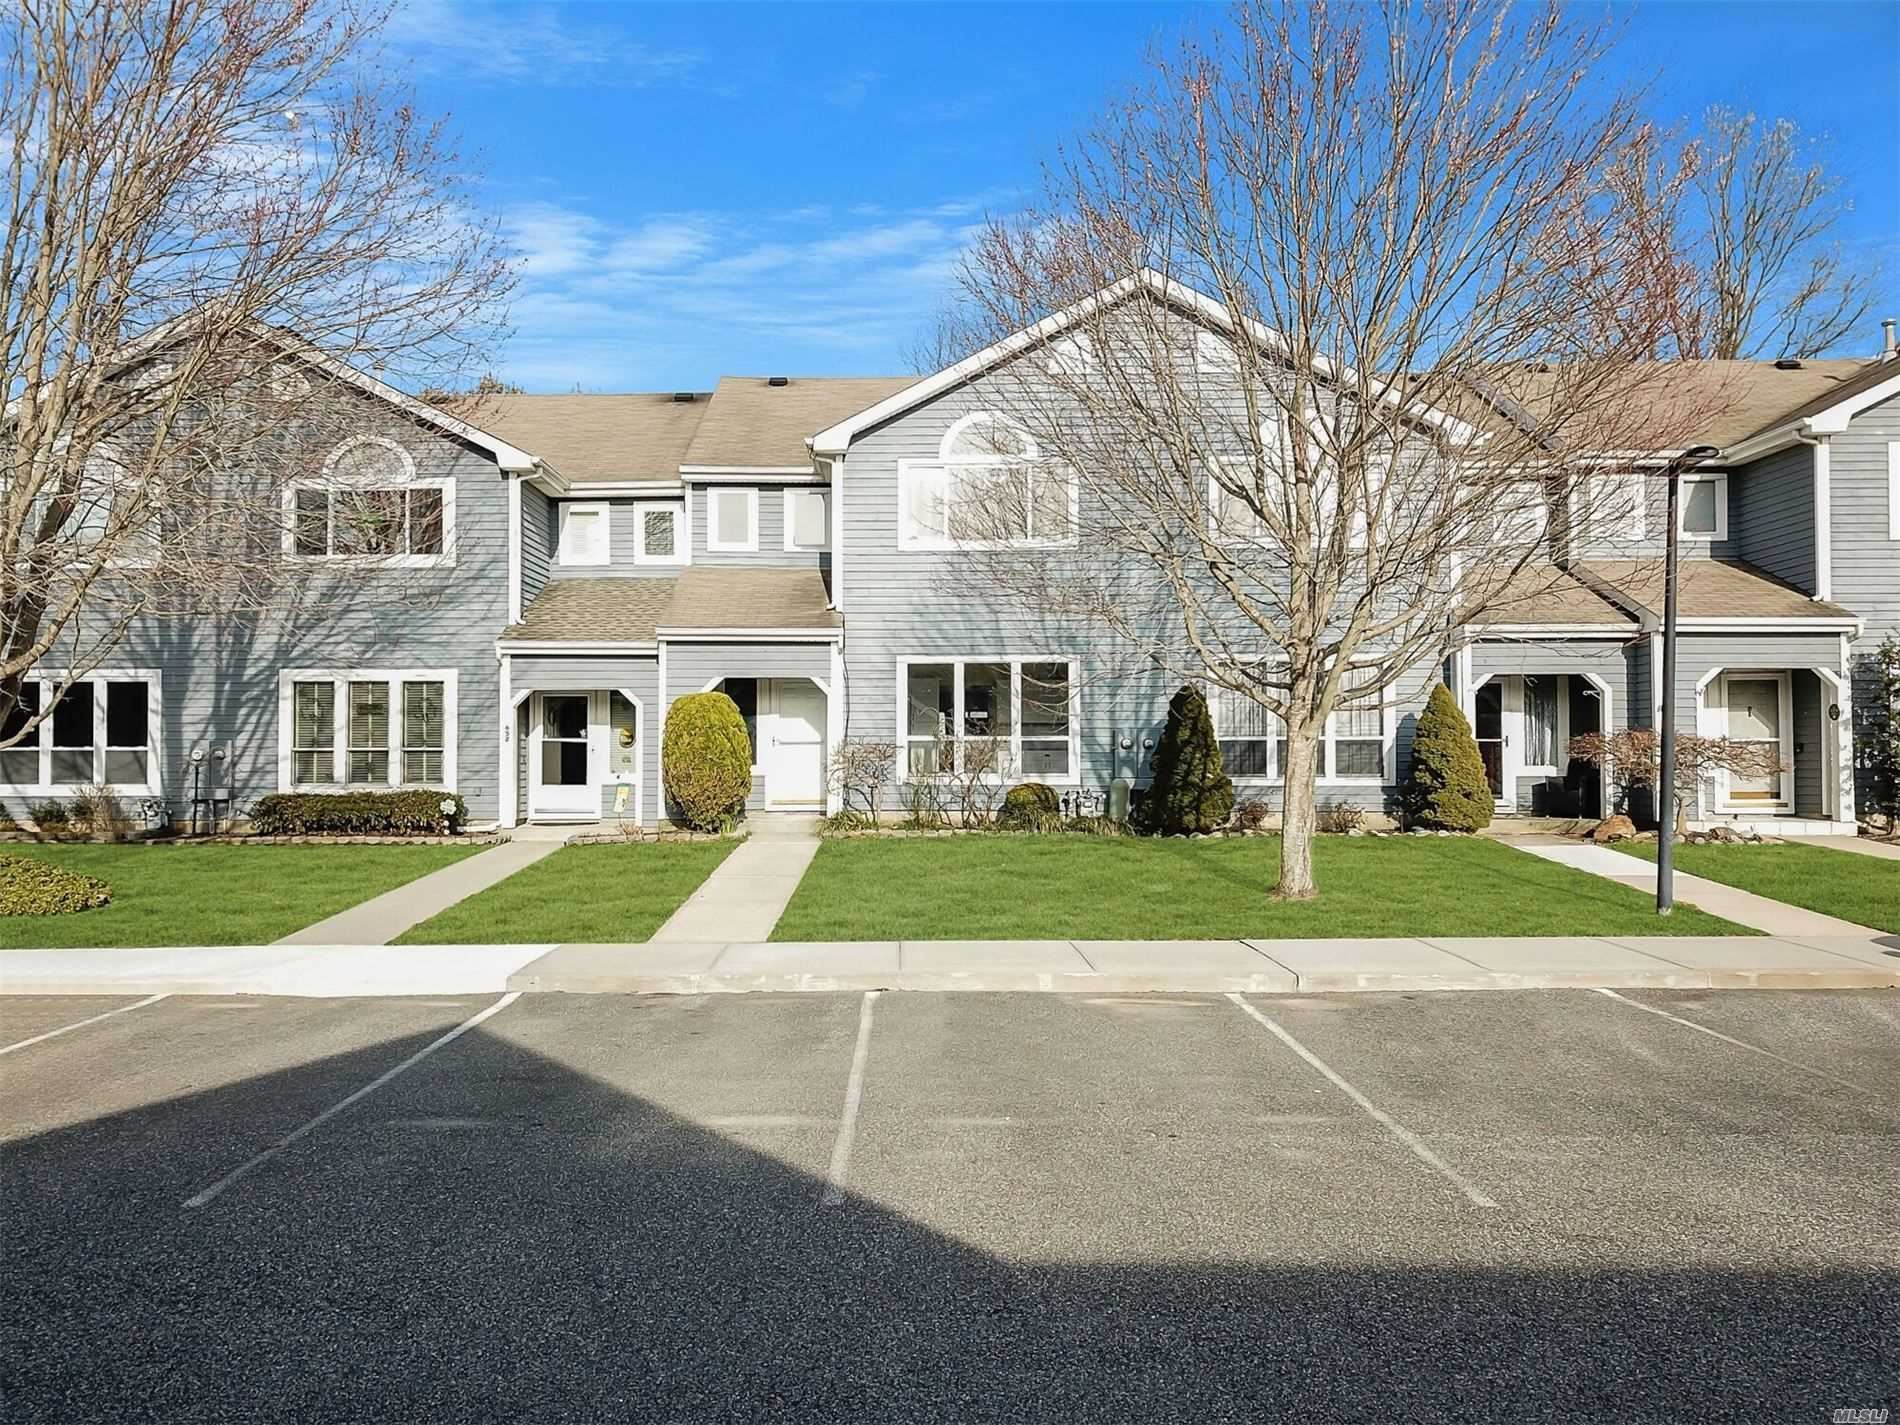 650 Birchwood Park Drive, Middle Island, NY 11953 - MLS#: 3207208